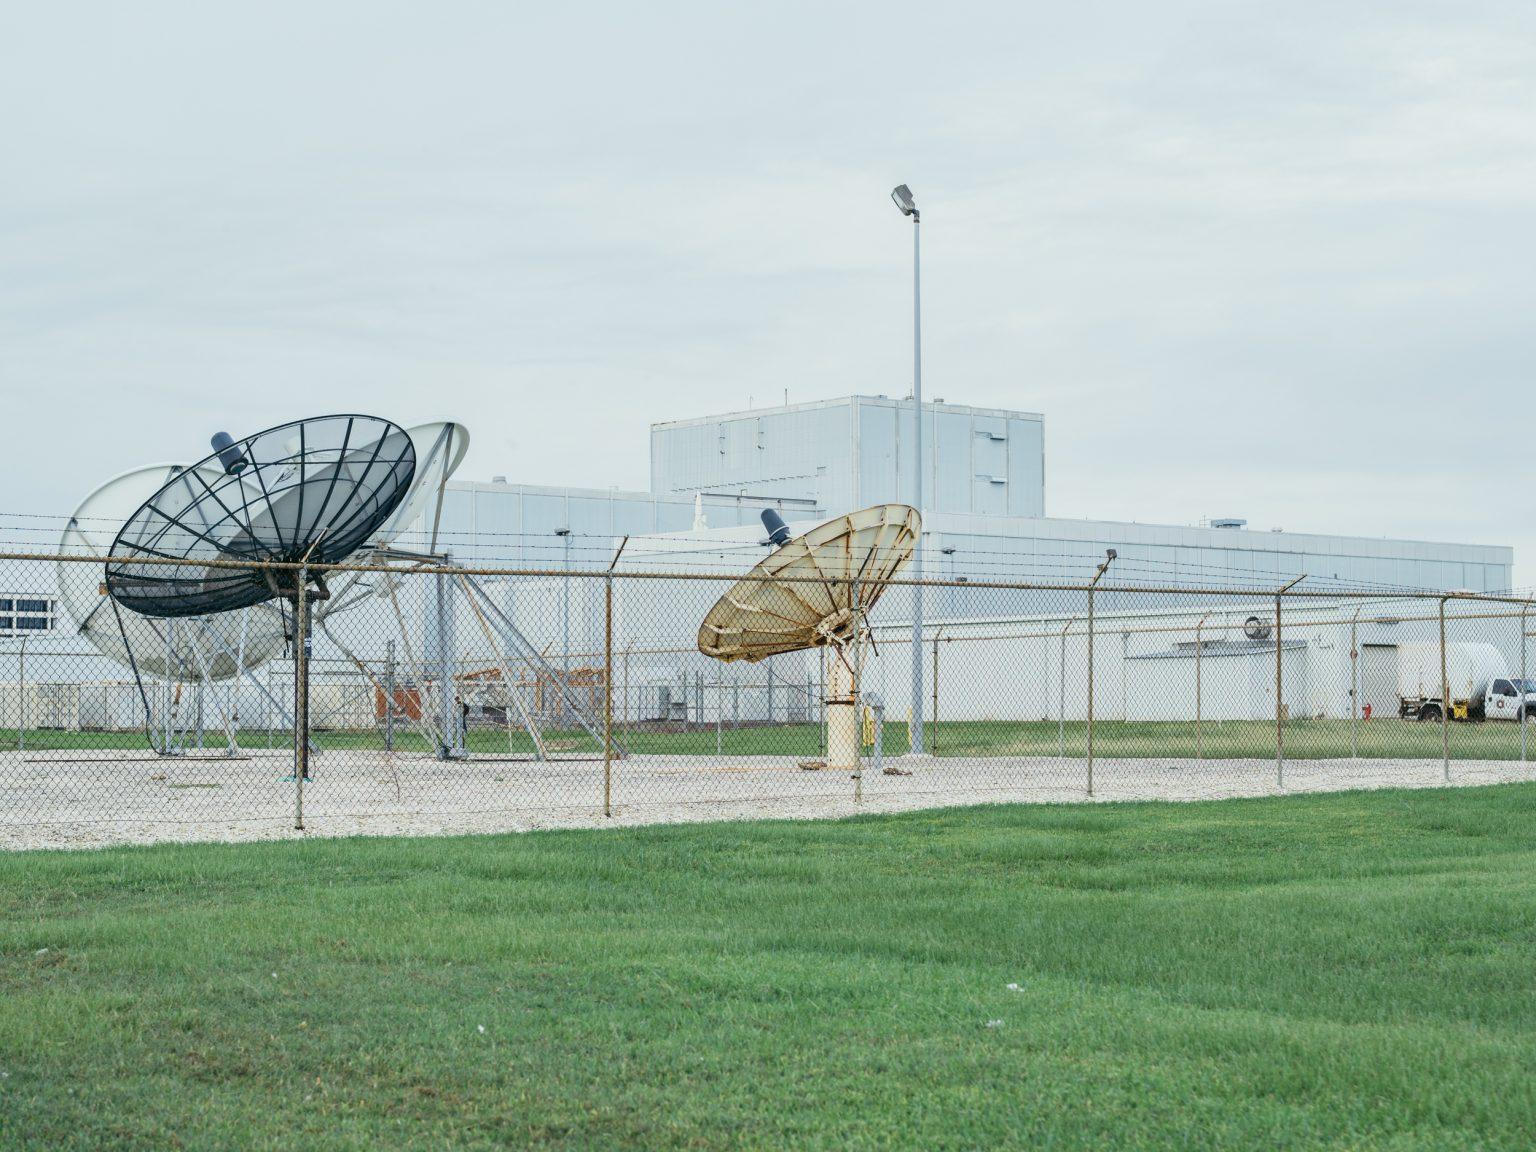 Radars. NASA Johnson Space Center, Houston, Texas, USA, 2018